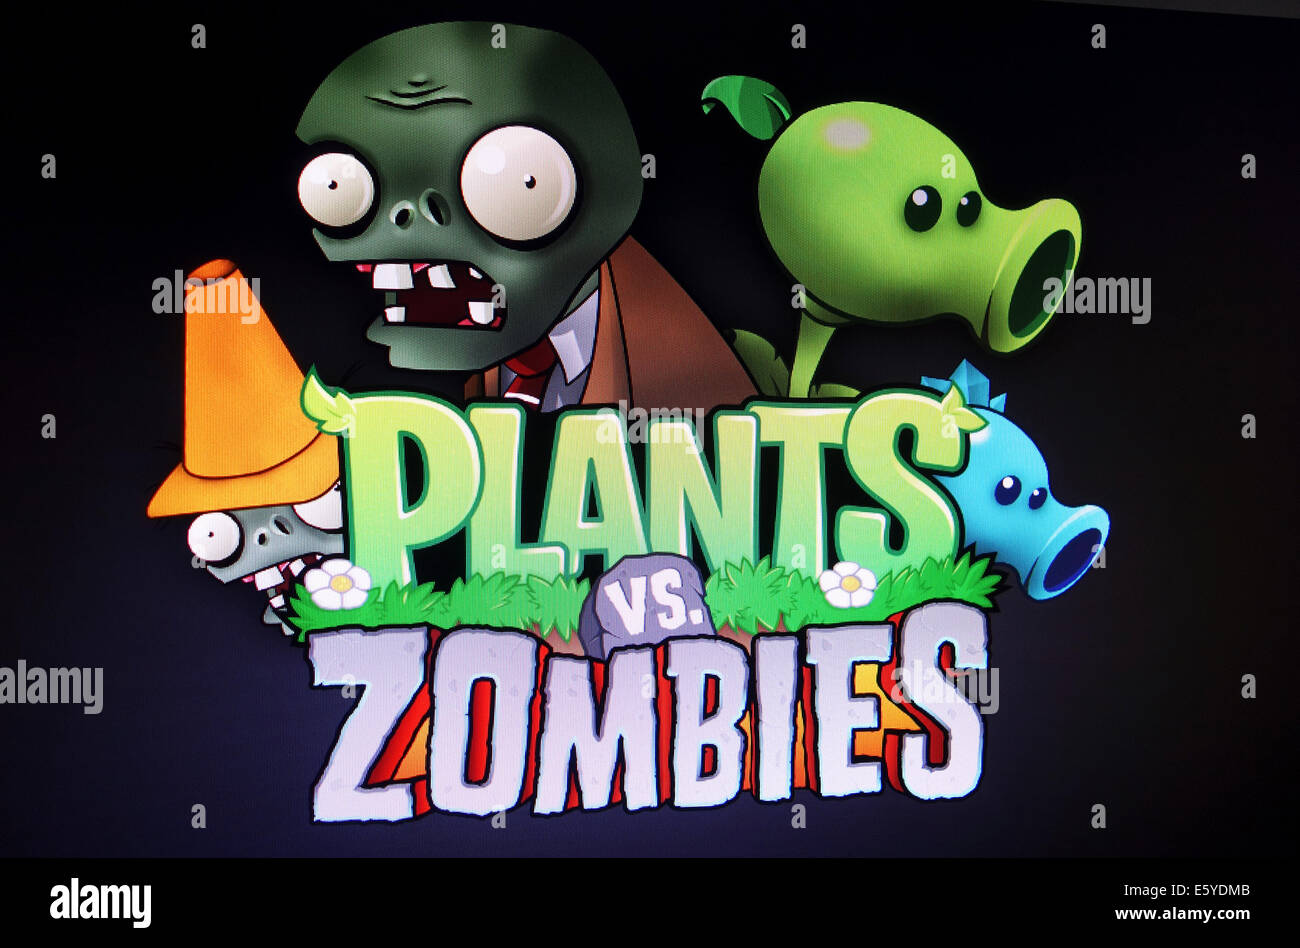 screenshot of Plants vs Zombies computer game Stock Photo